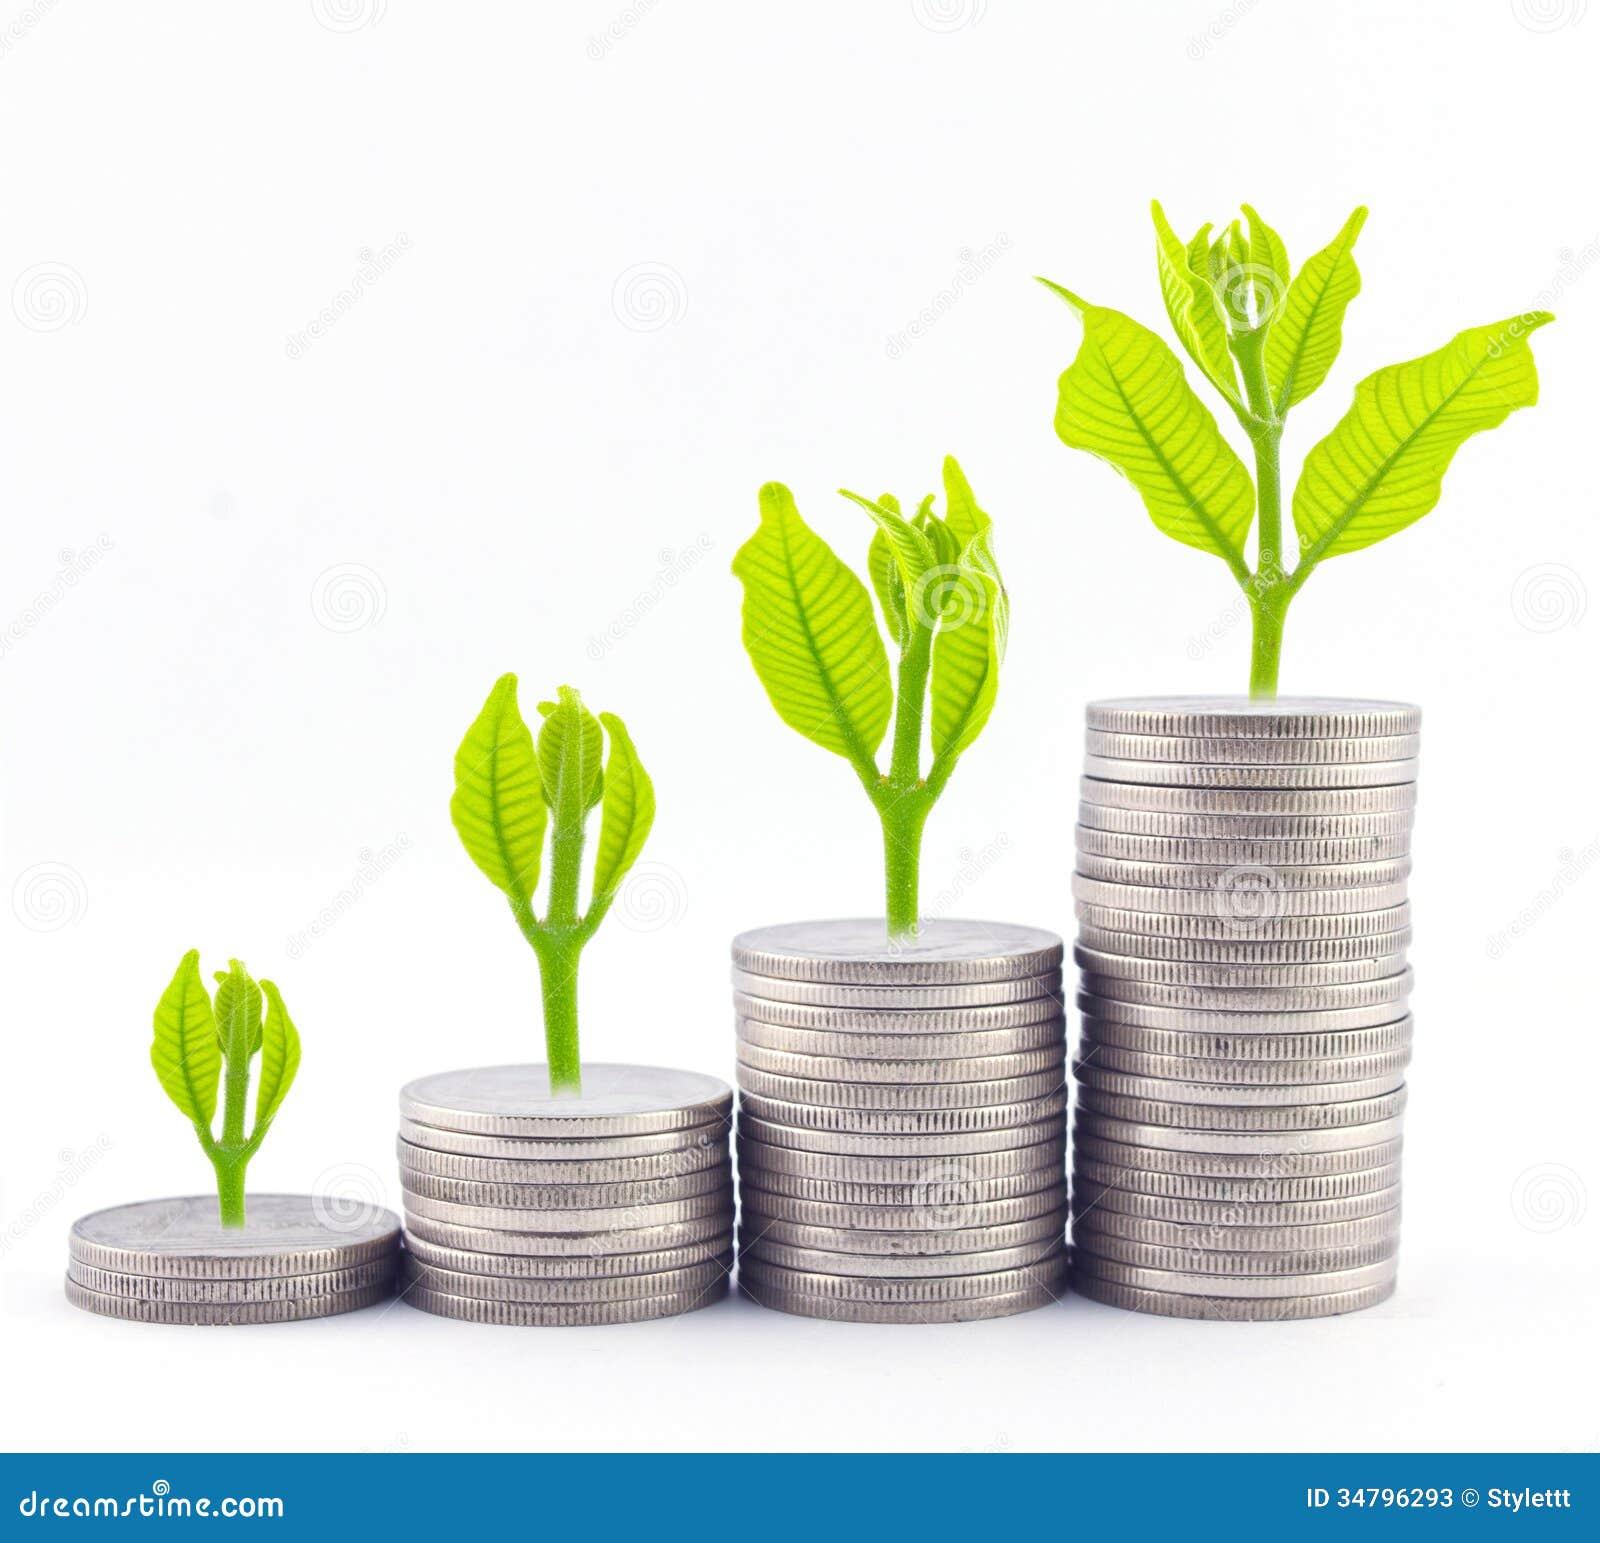 Increase Your Savings Stock Photos Image 34796293